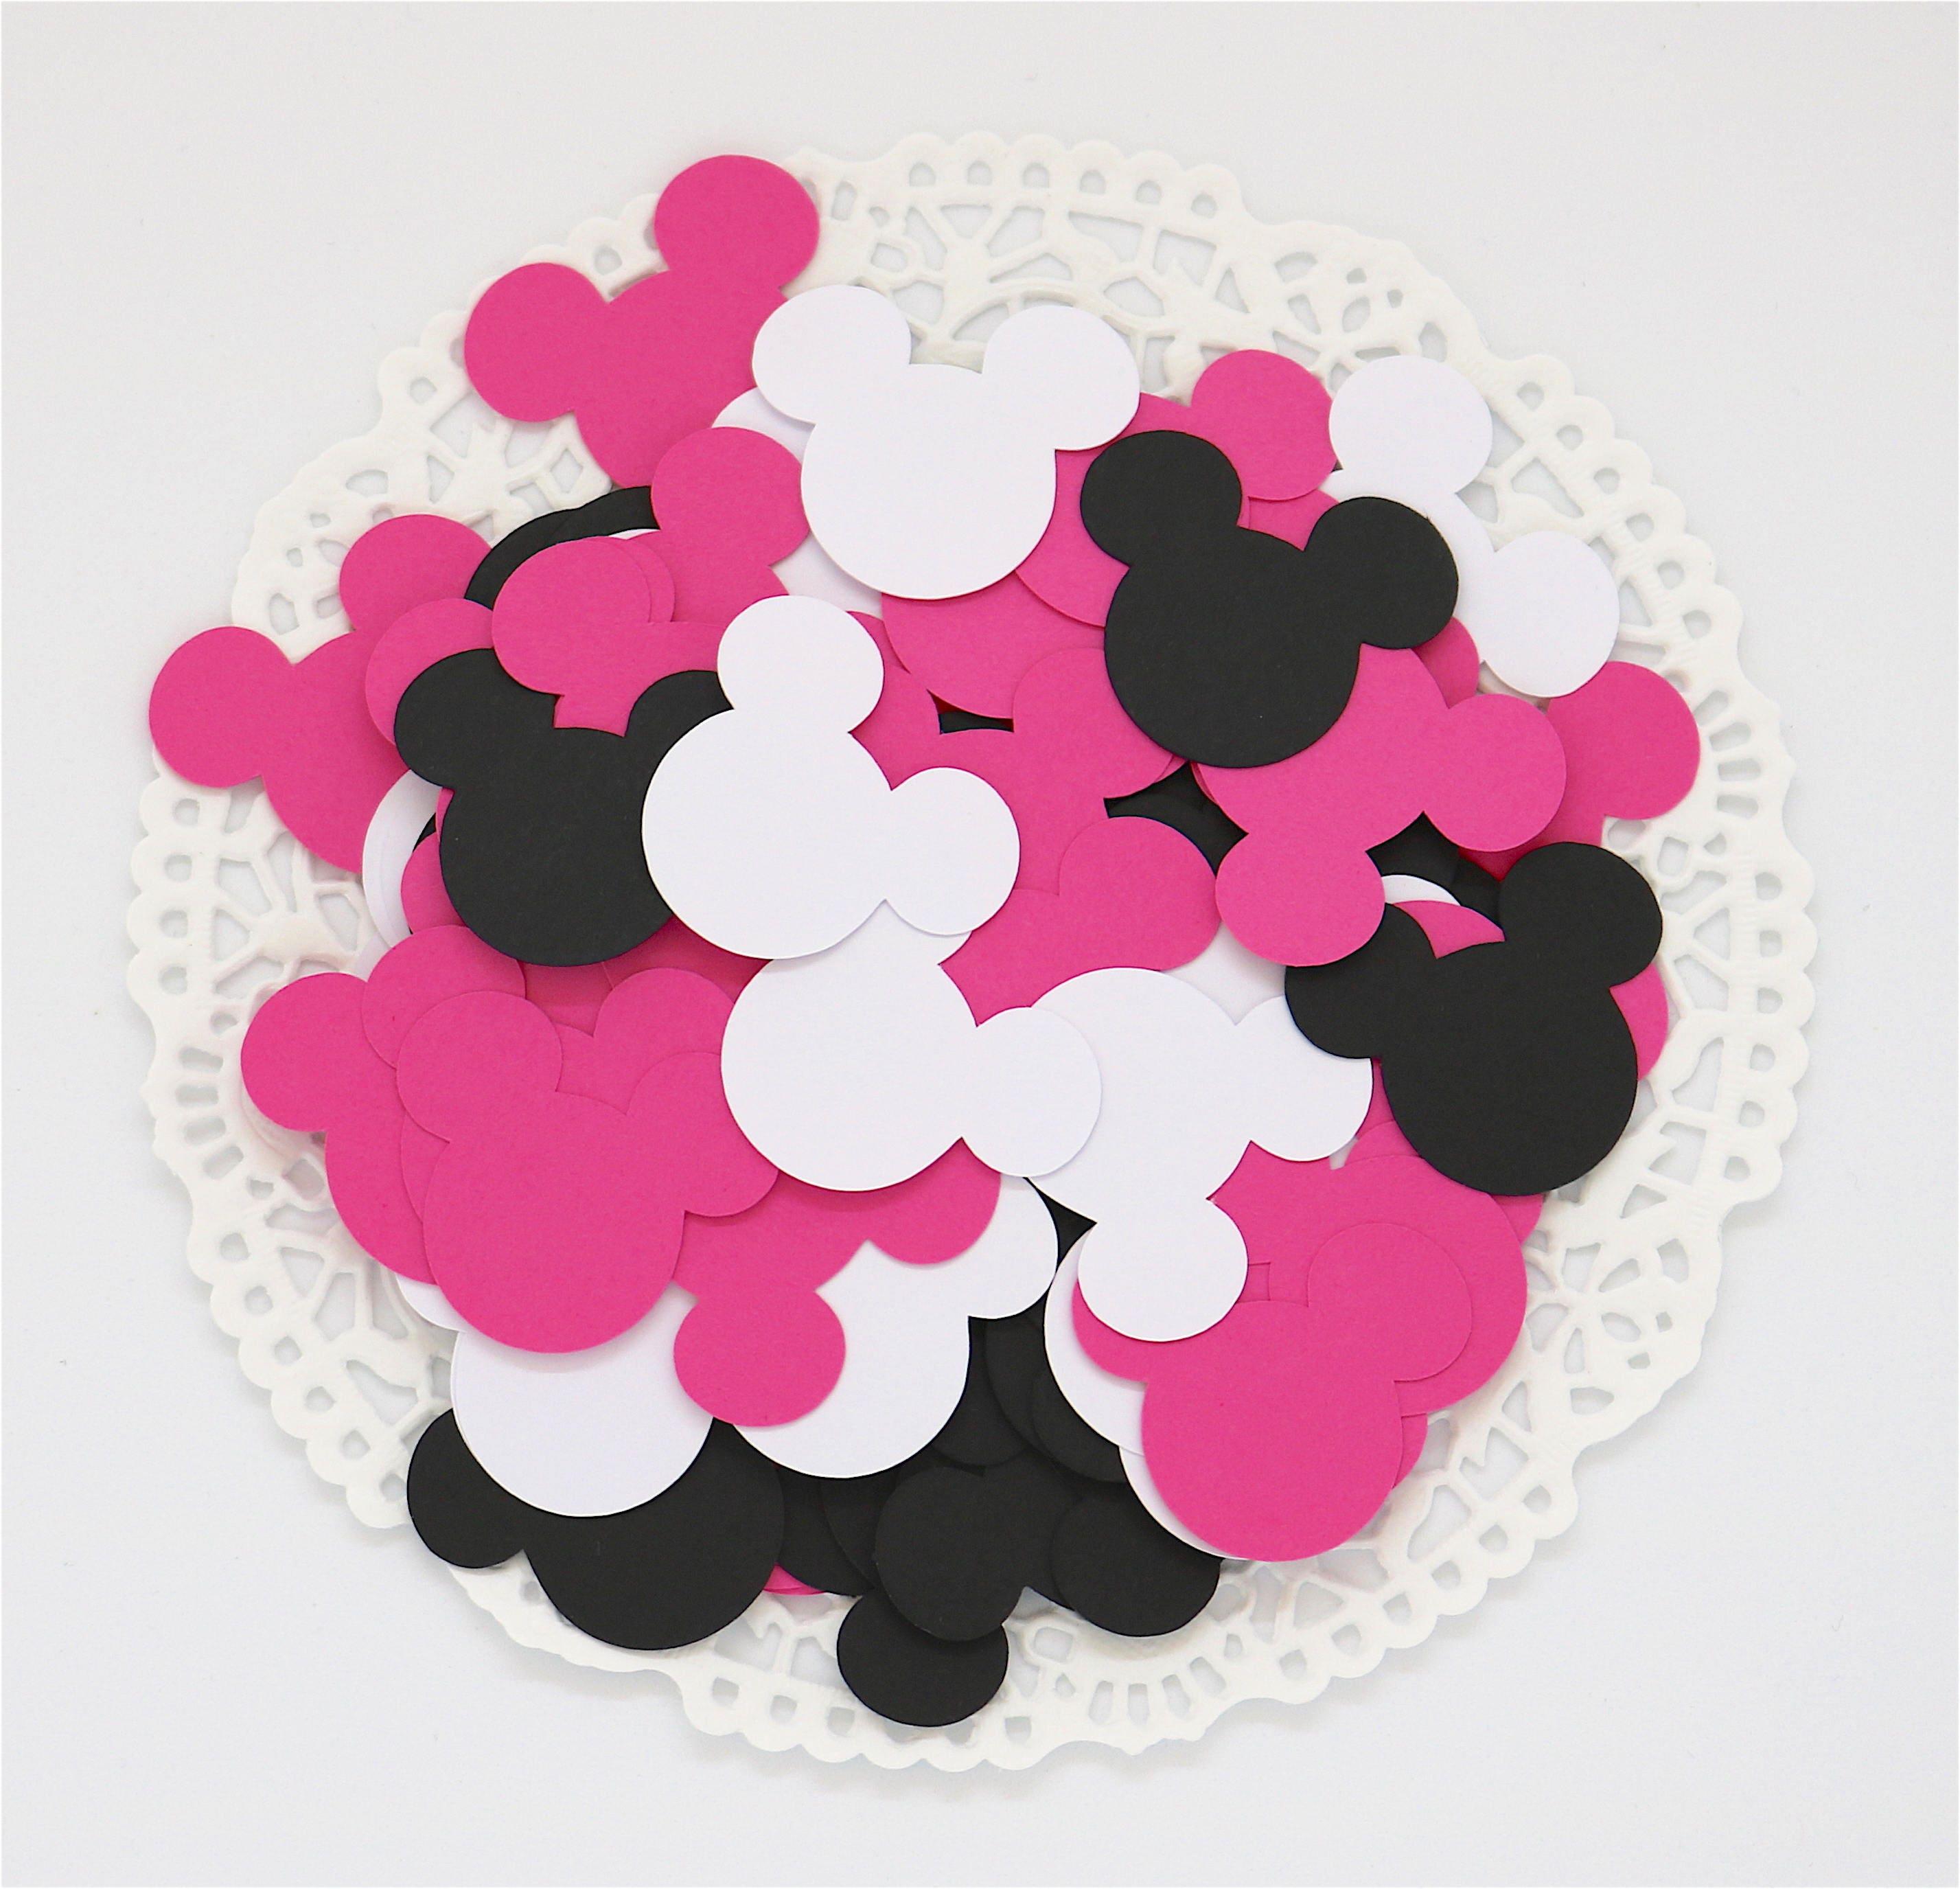 Confettis Minnie Mickey Anniversaire Enfant Decoration Etsy